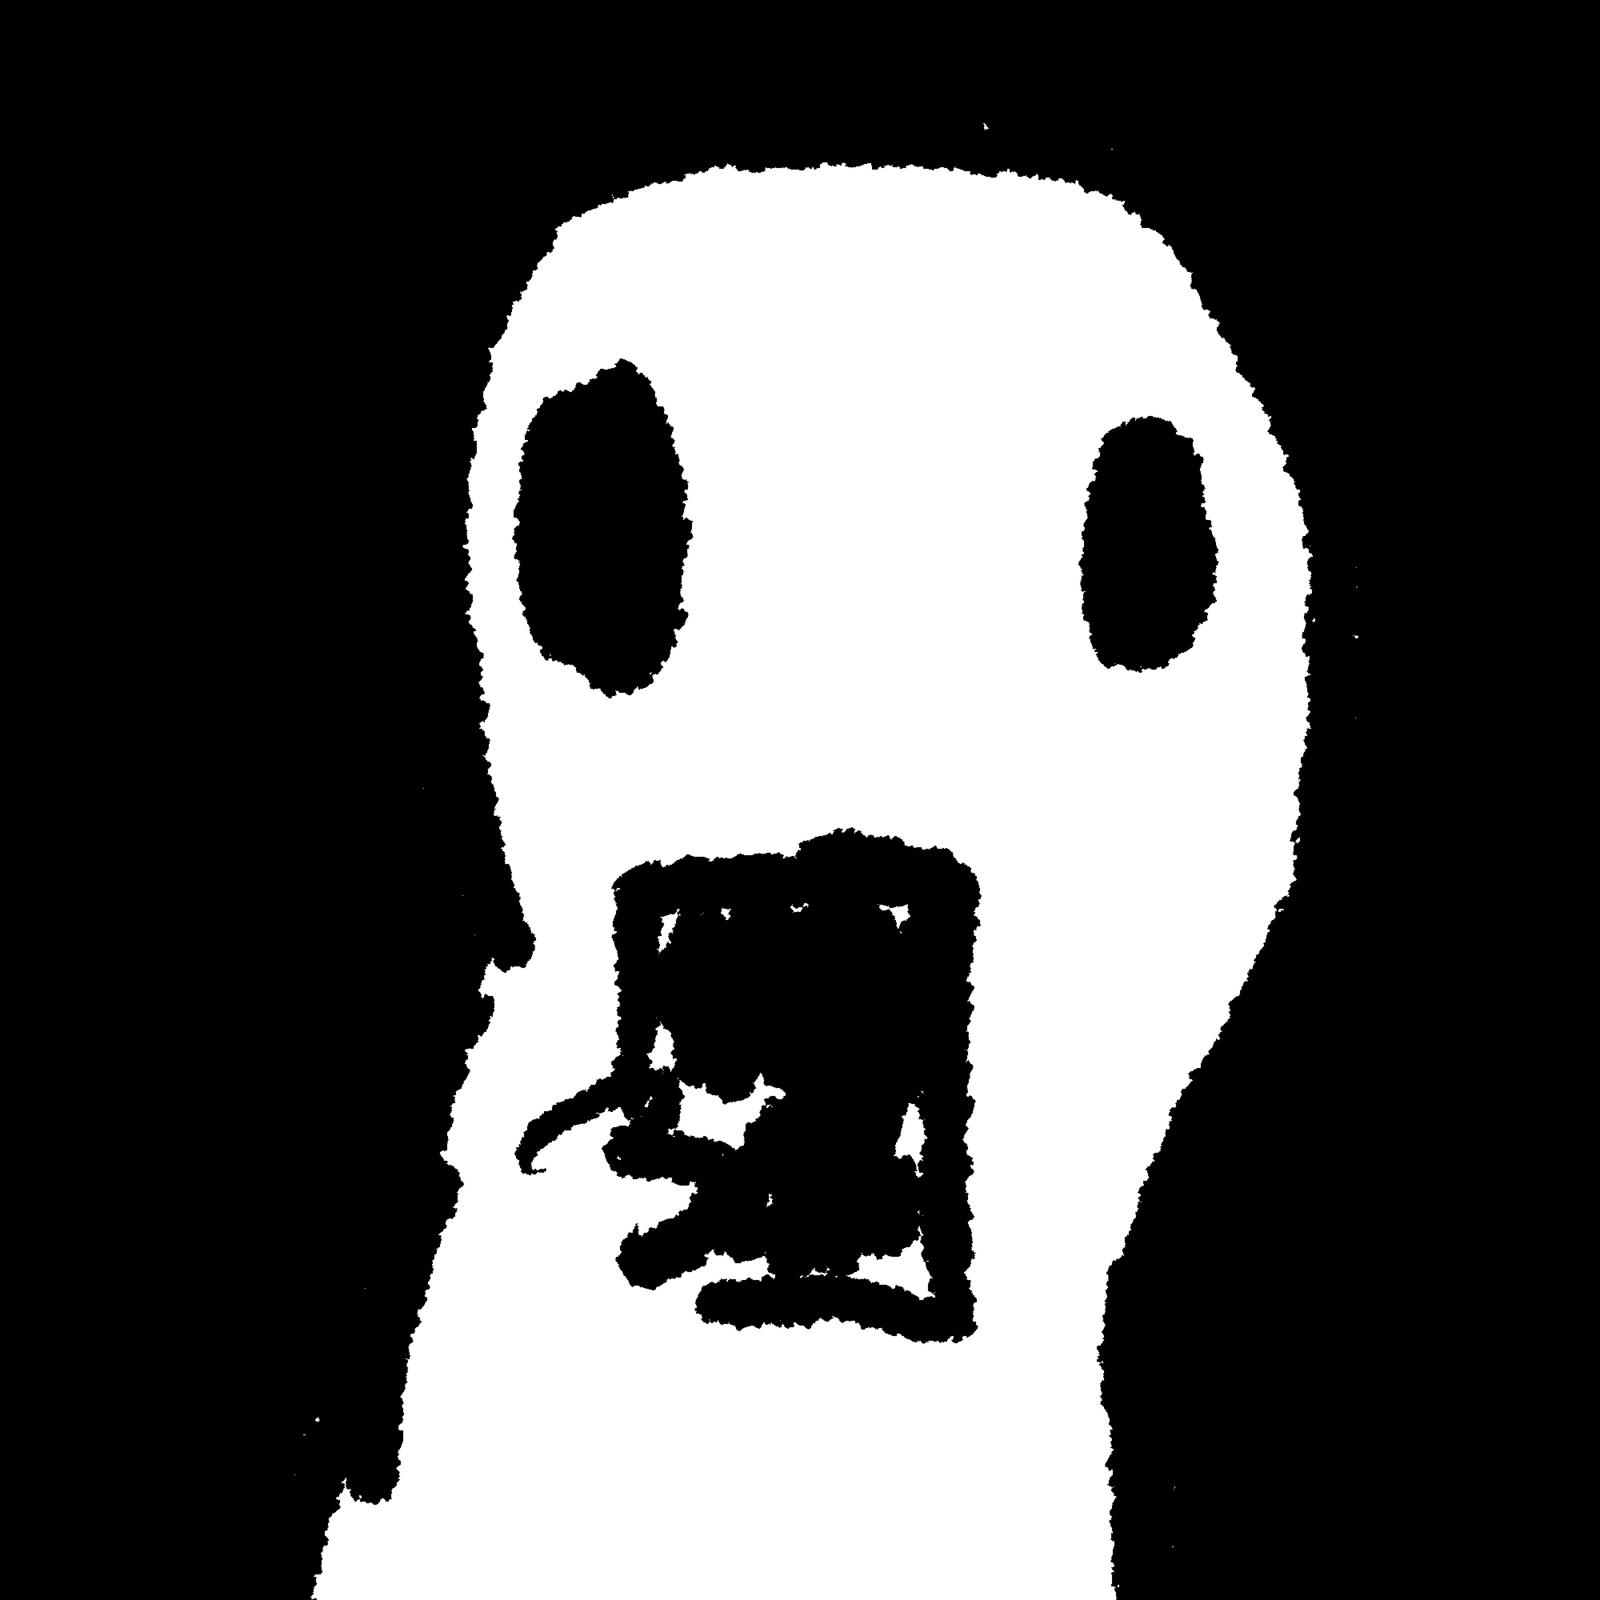 f:id:Haruosan:20200106054706p:plain